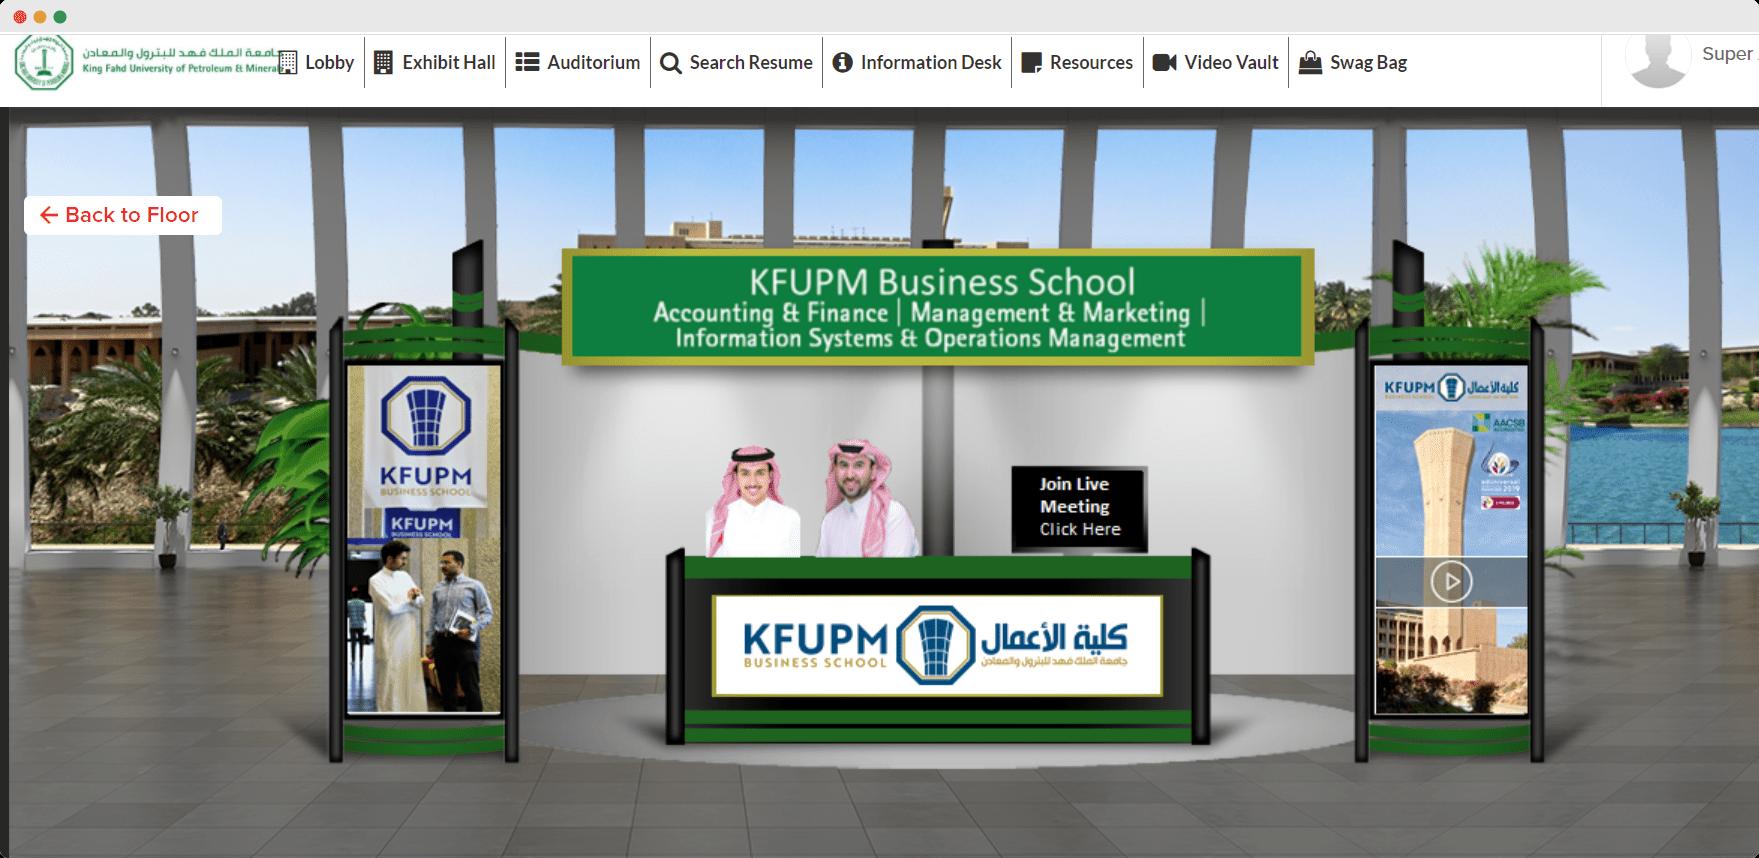 KFUPM virtual booth